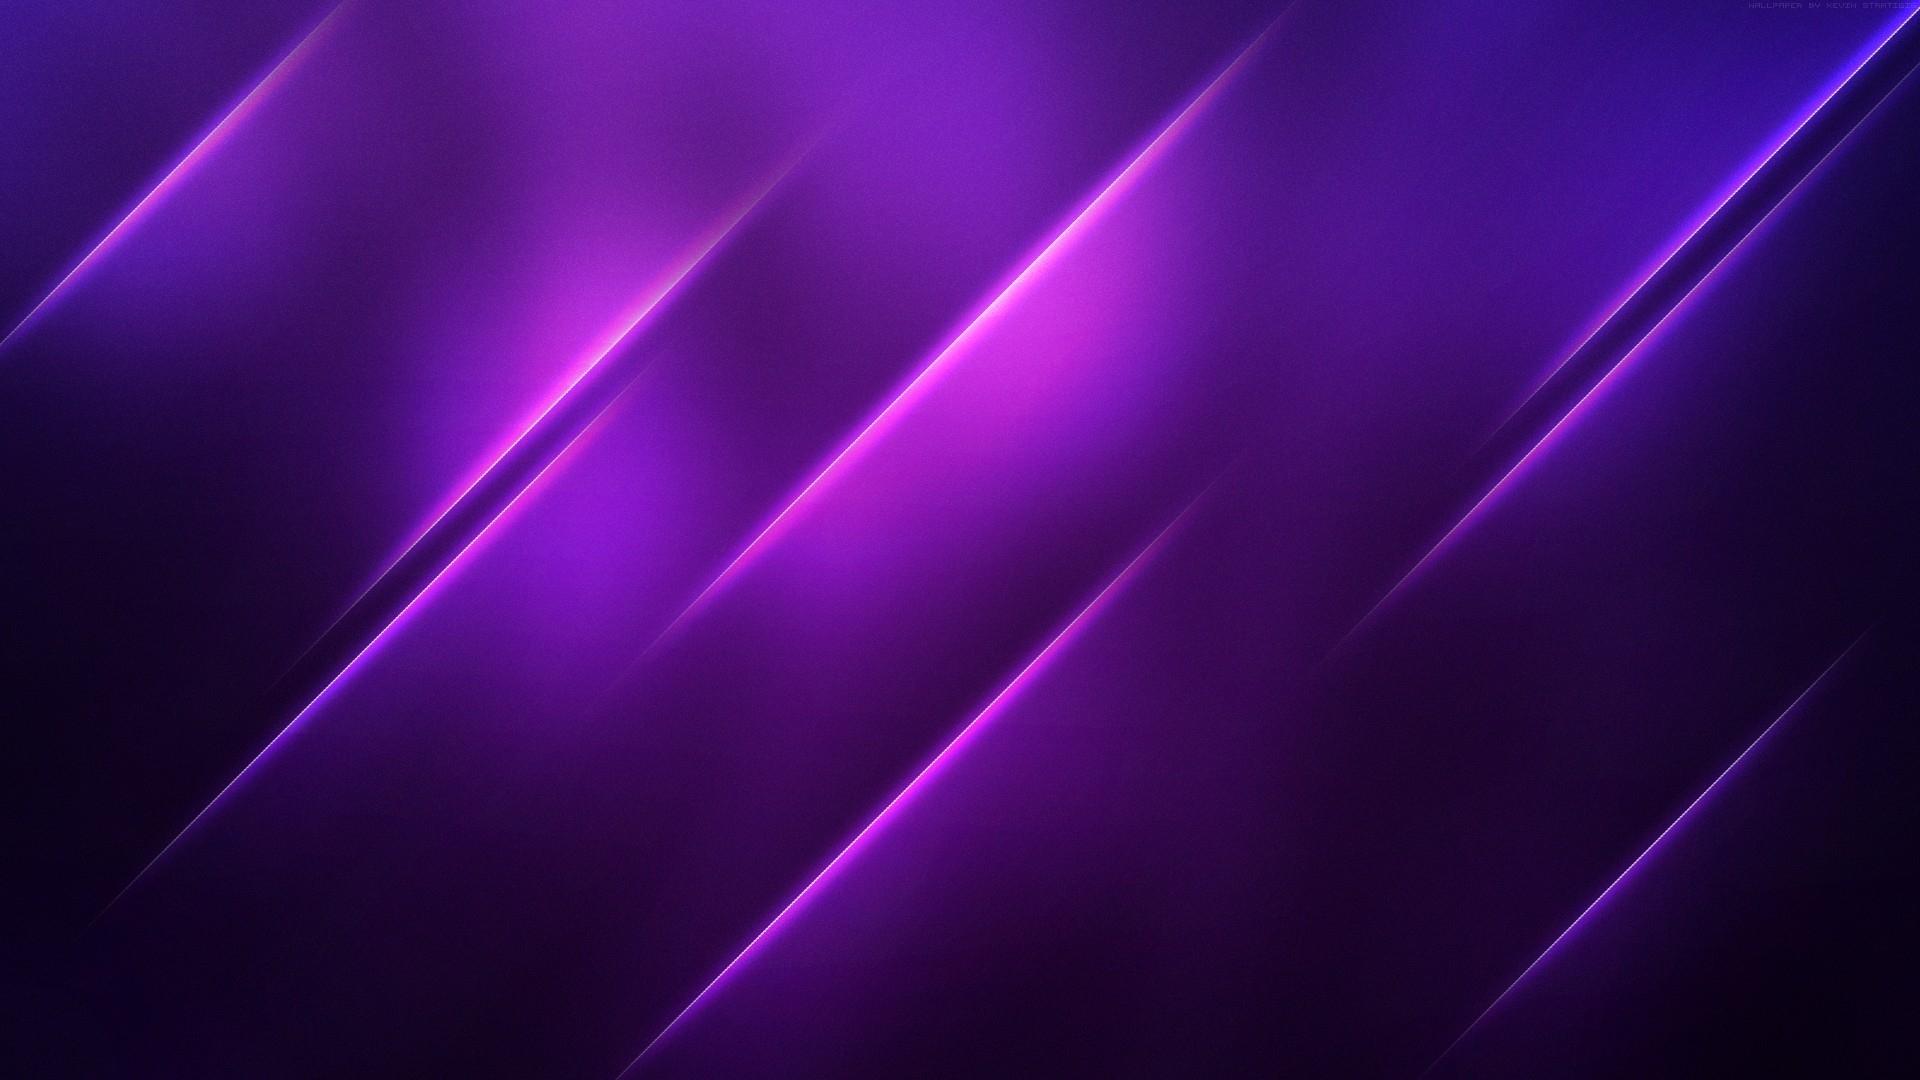 Purple Backgrounds wallpaper 1920x1080 57705 1920x1080